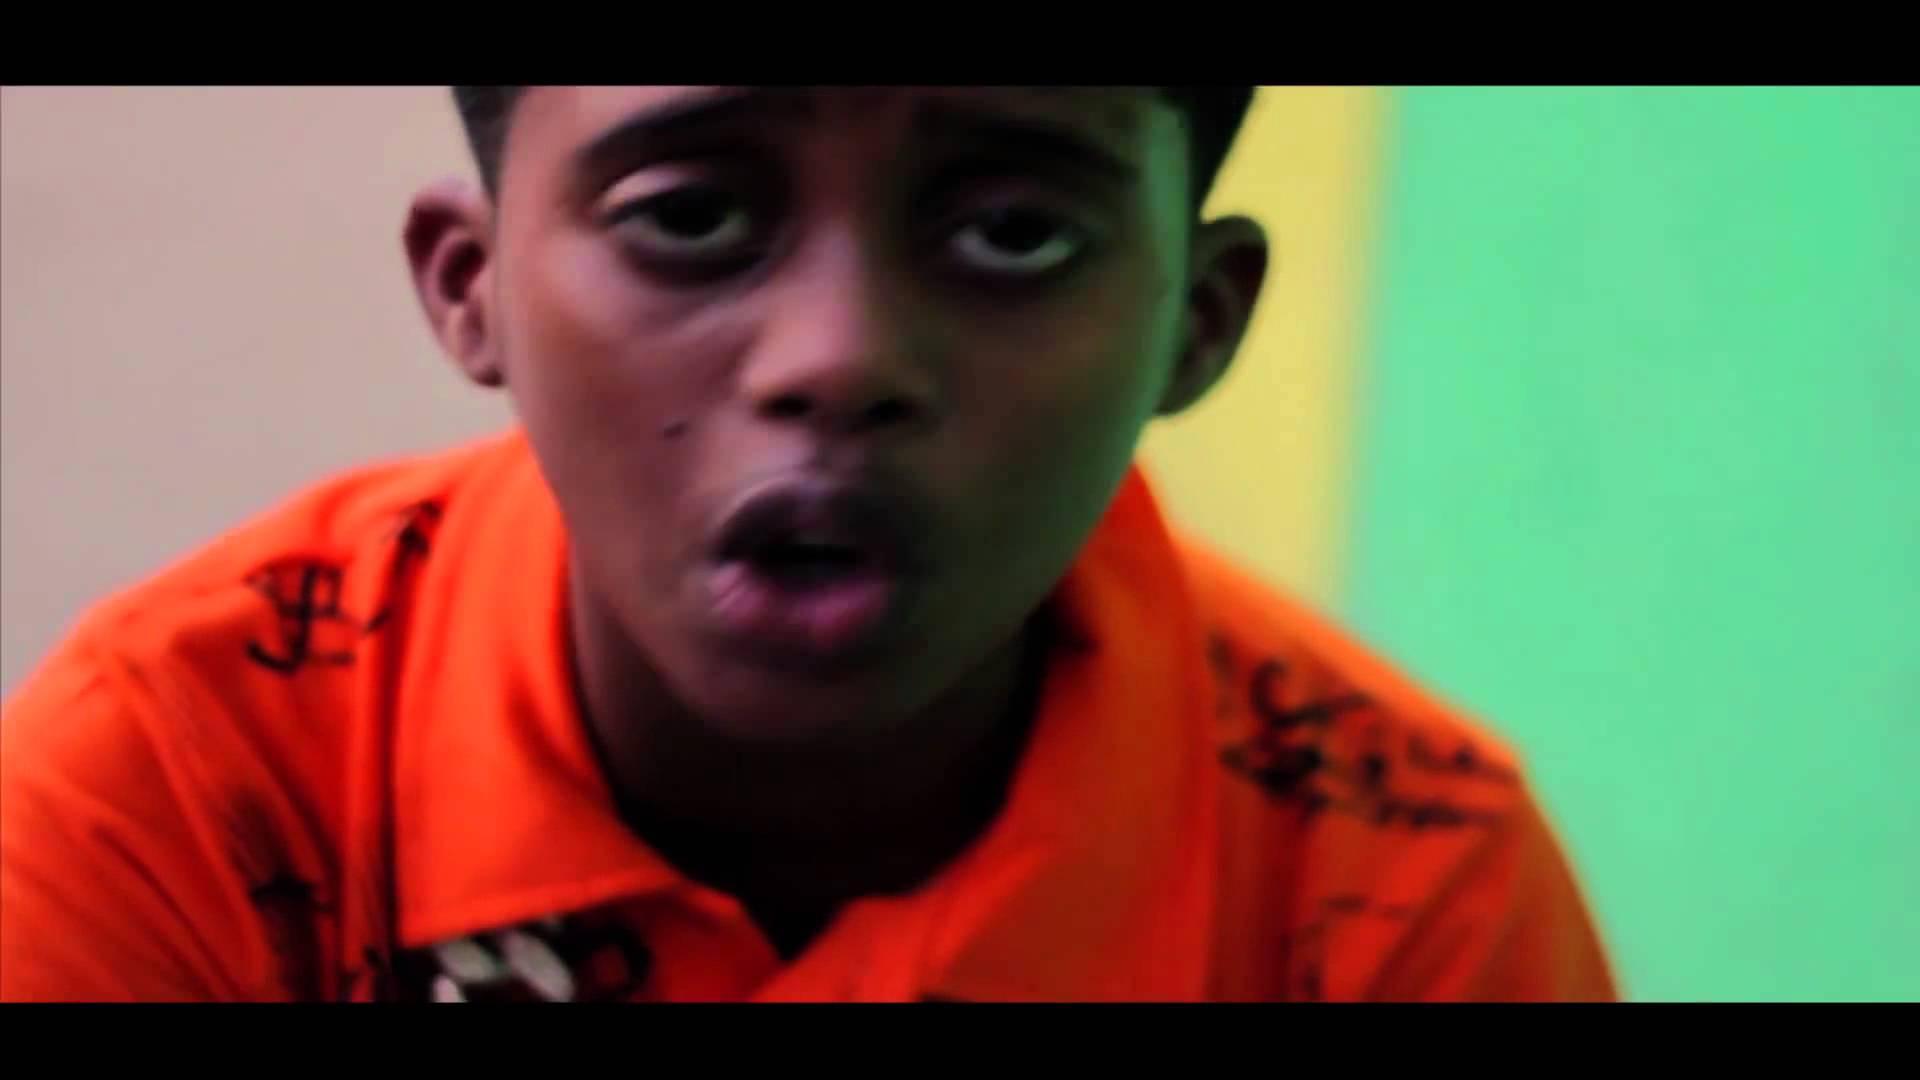 Wayne J - One Panadol aka Chikungunya [12/11/2014]